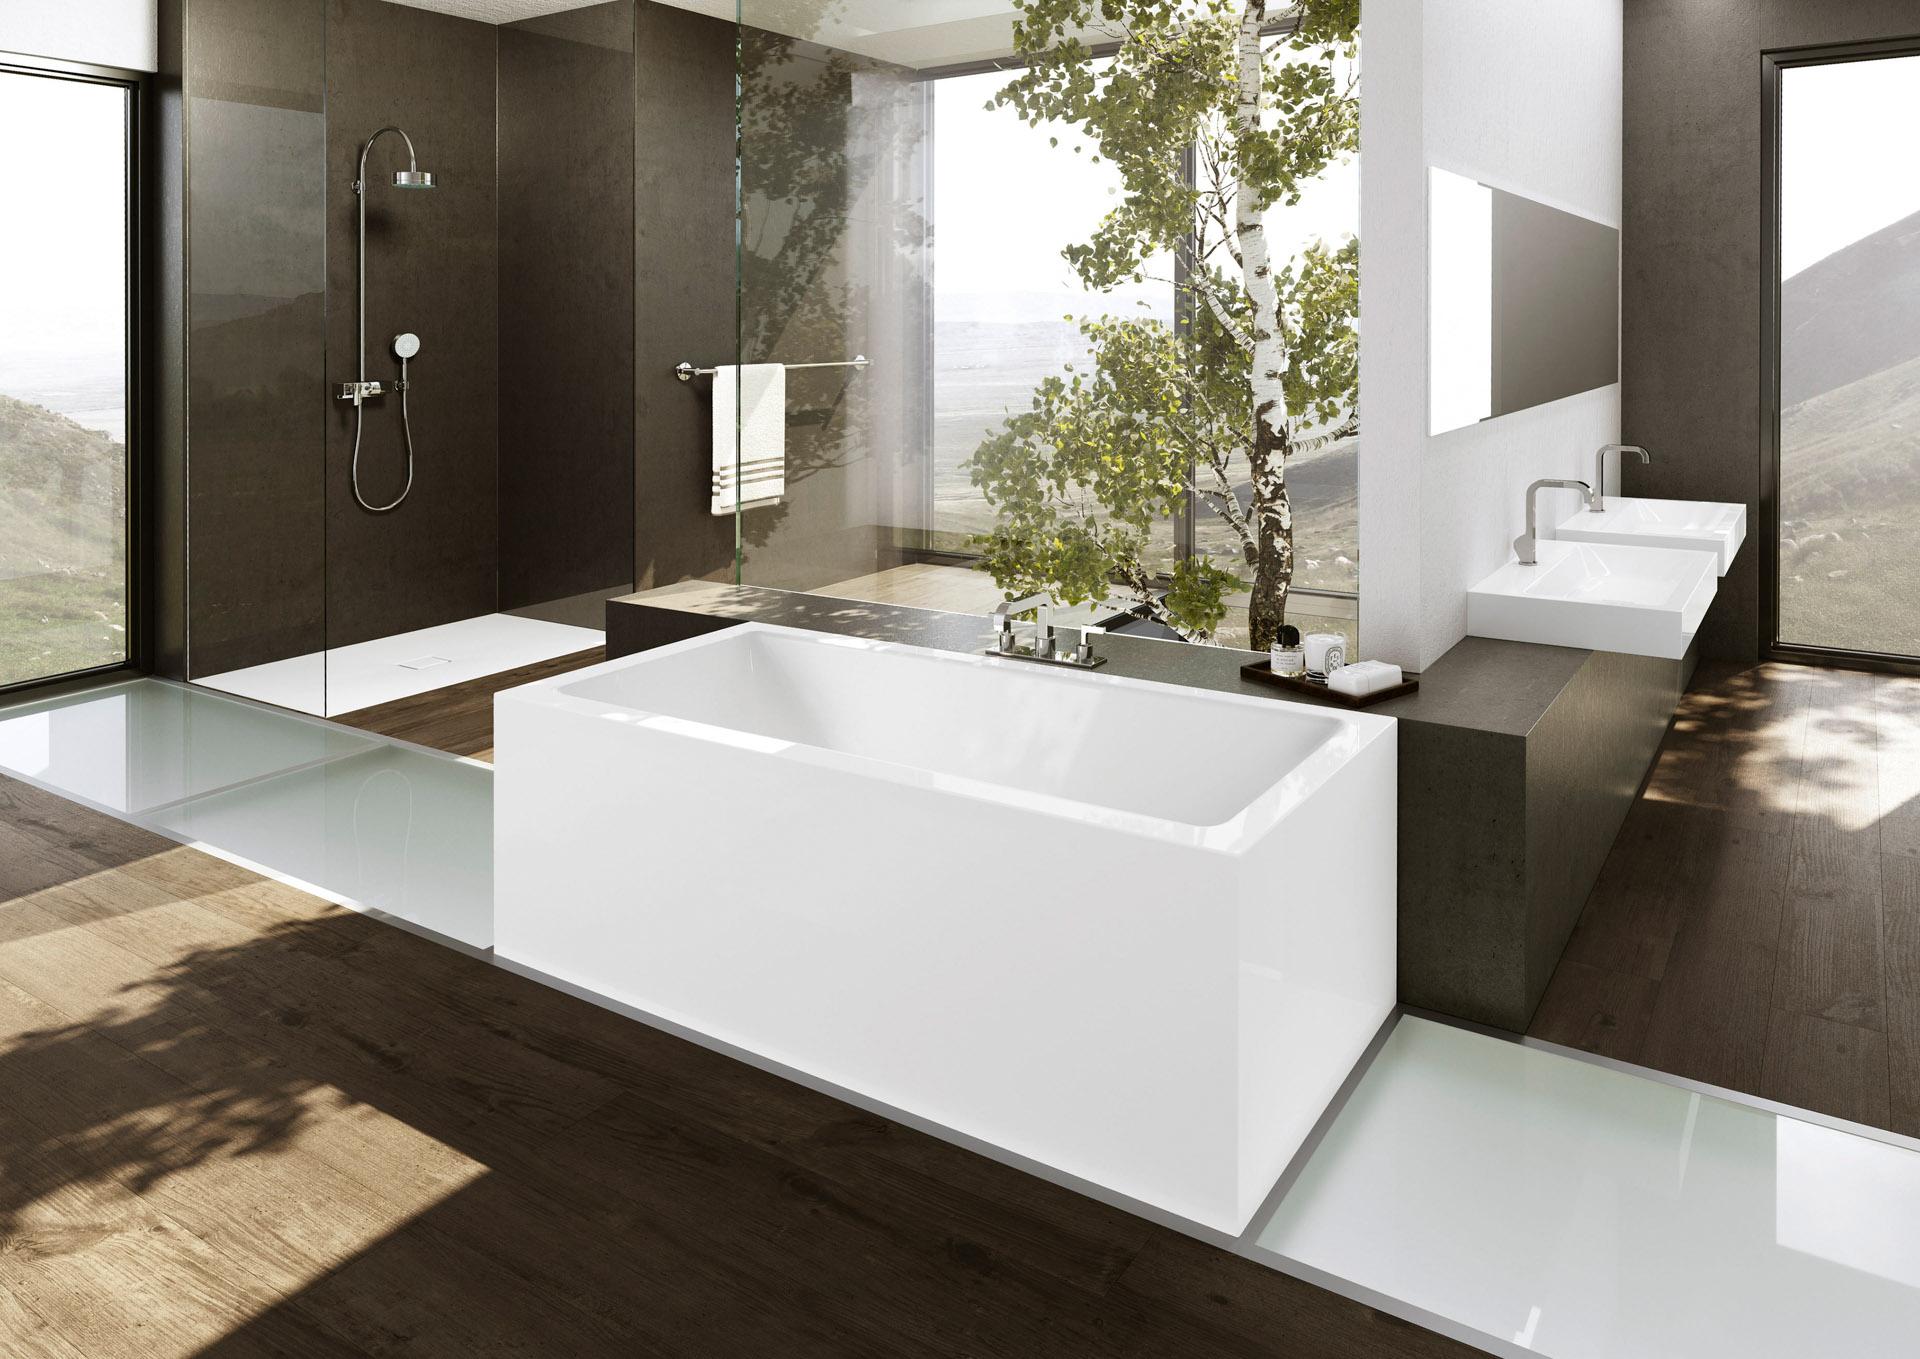 home-design-baignoires-acier-emaille-4